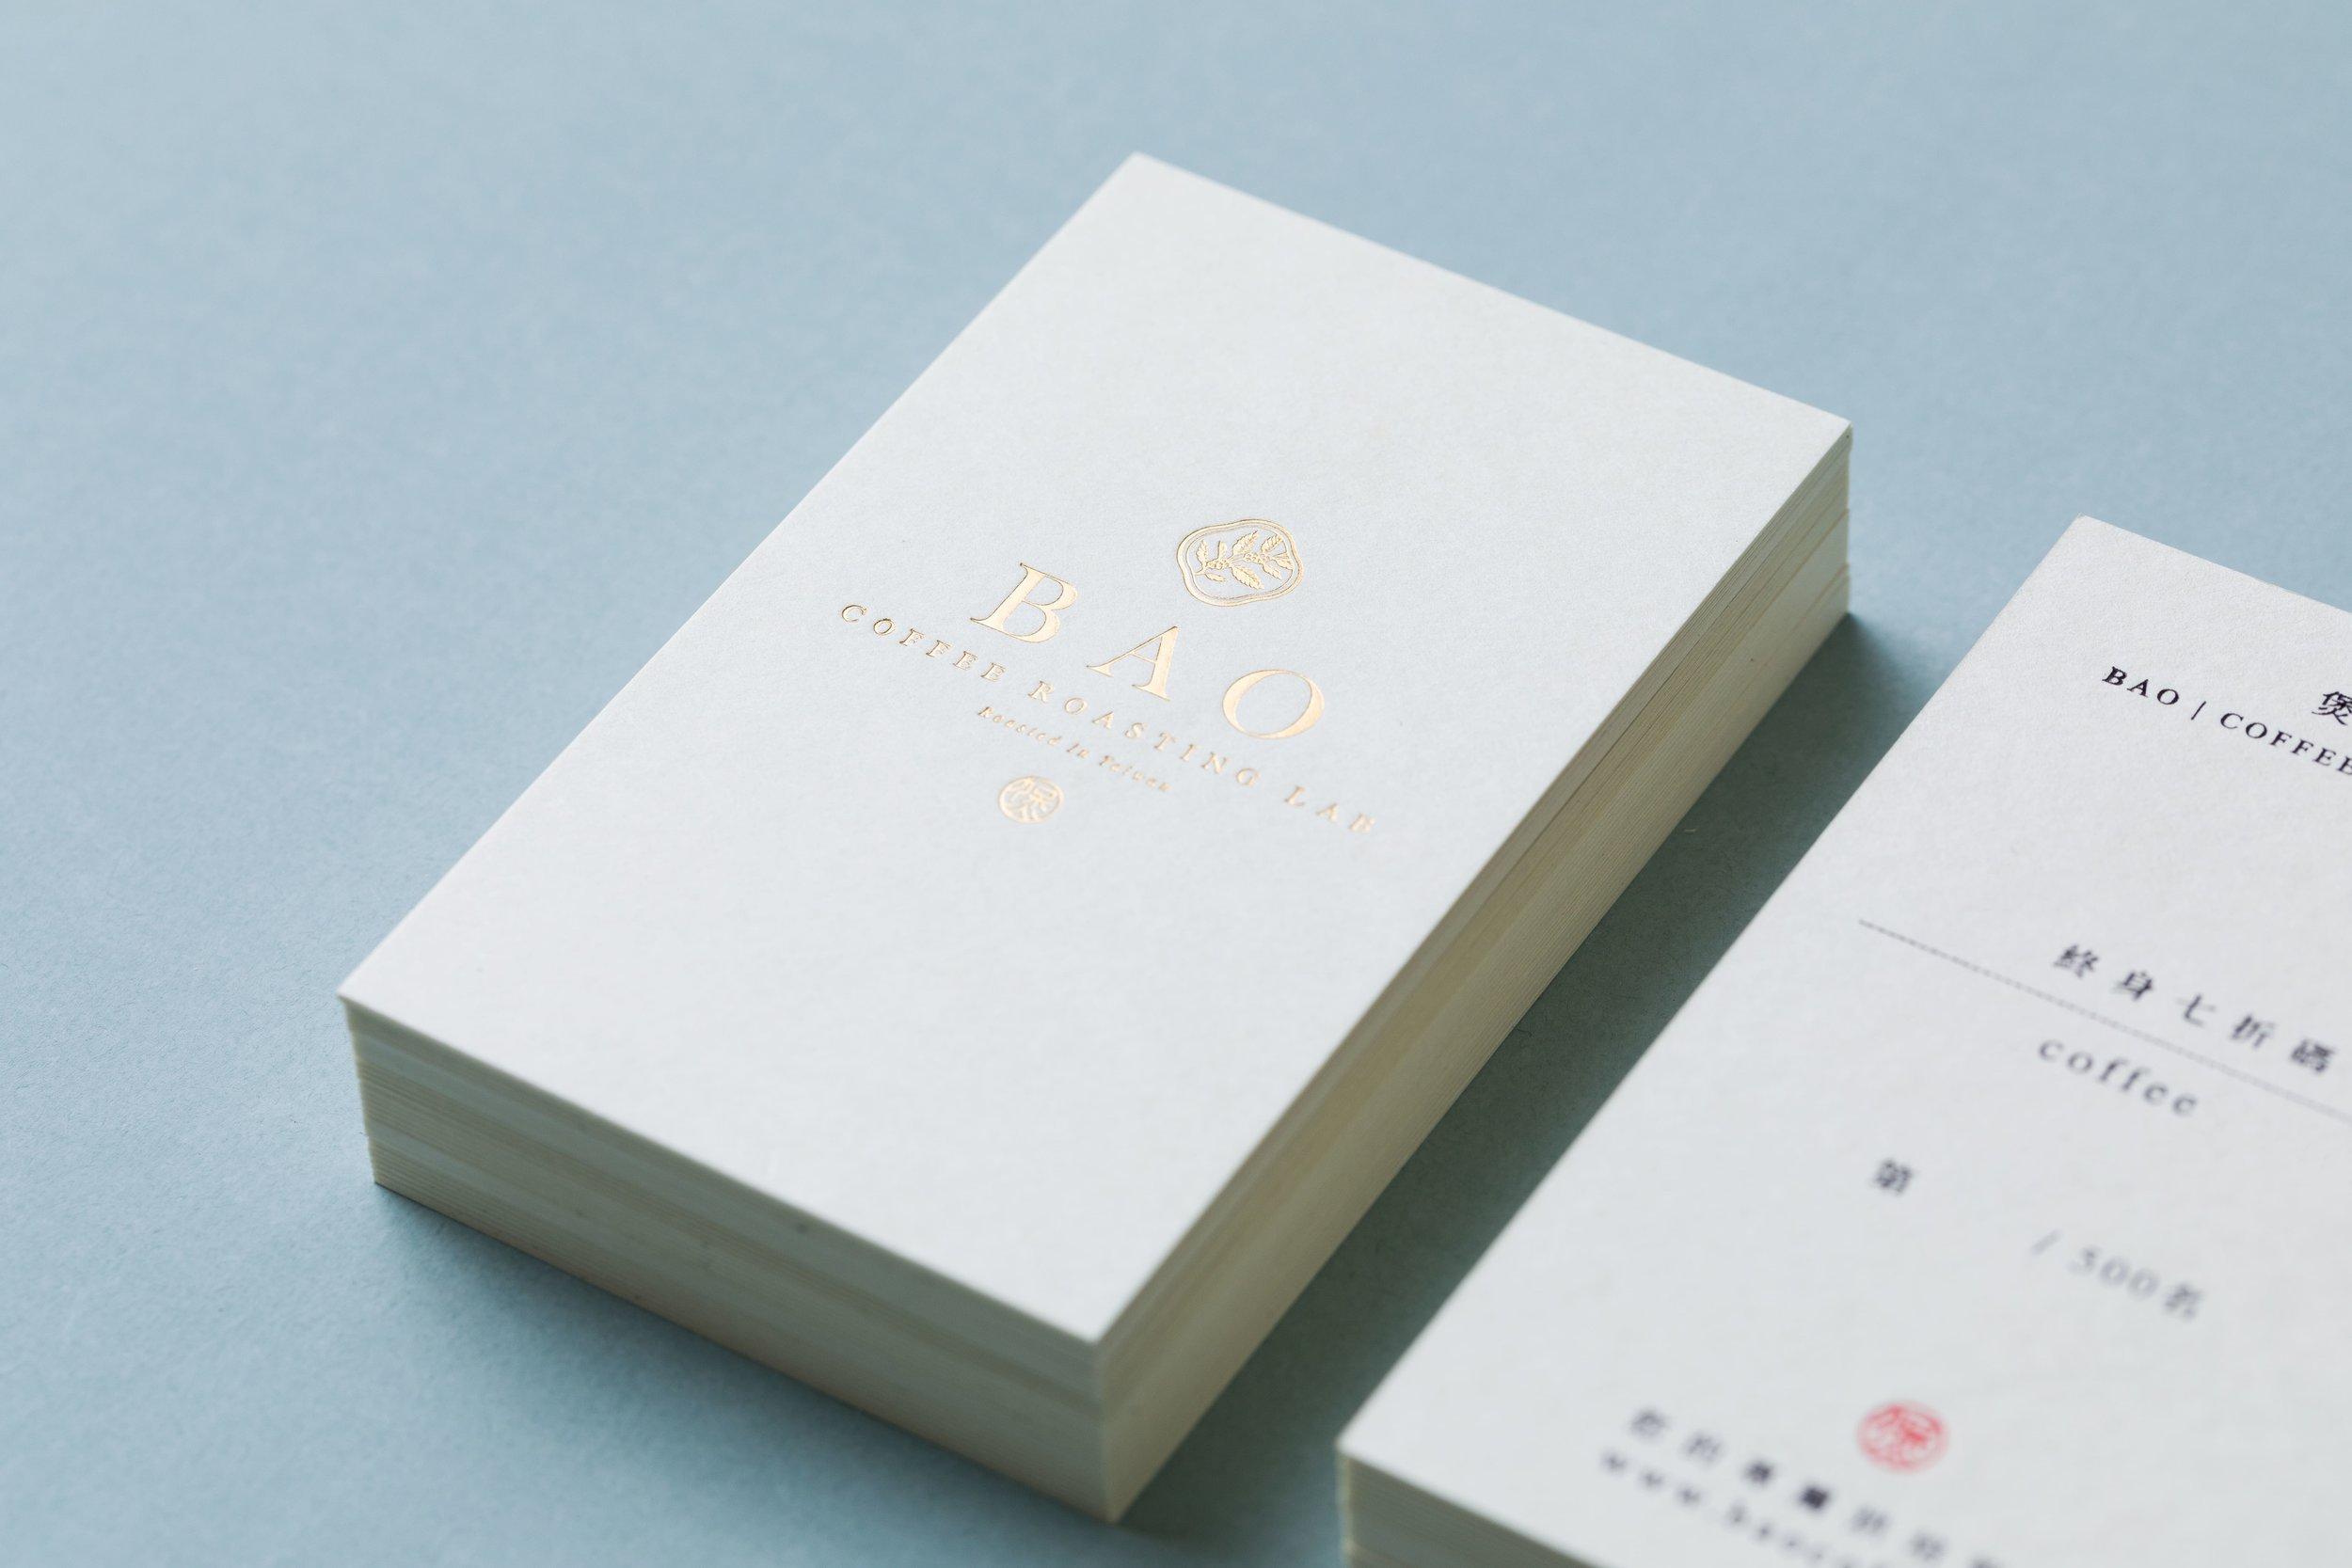 studiopros_bao card_12.jpg